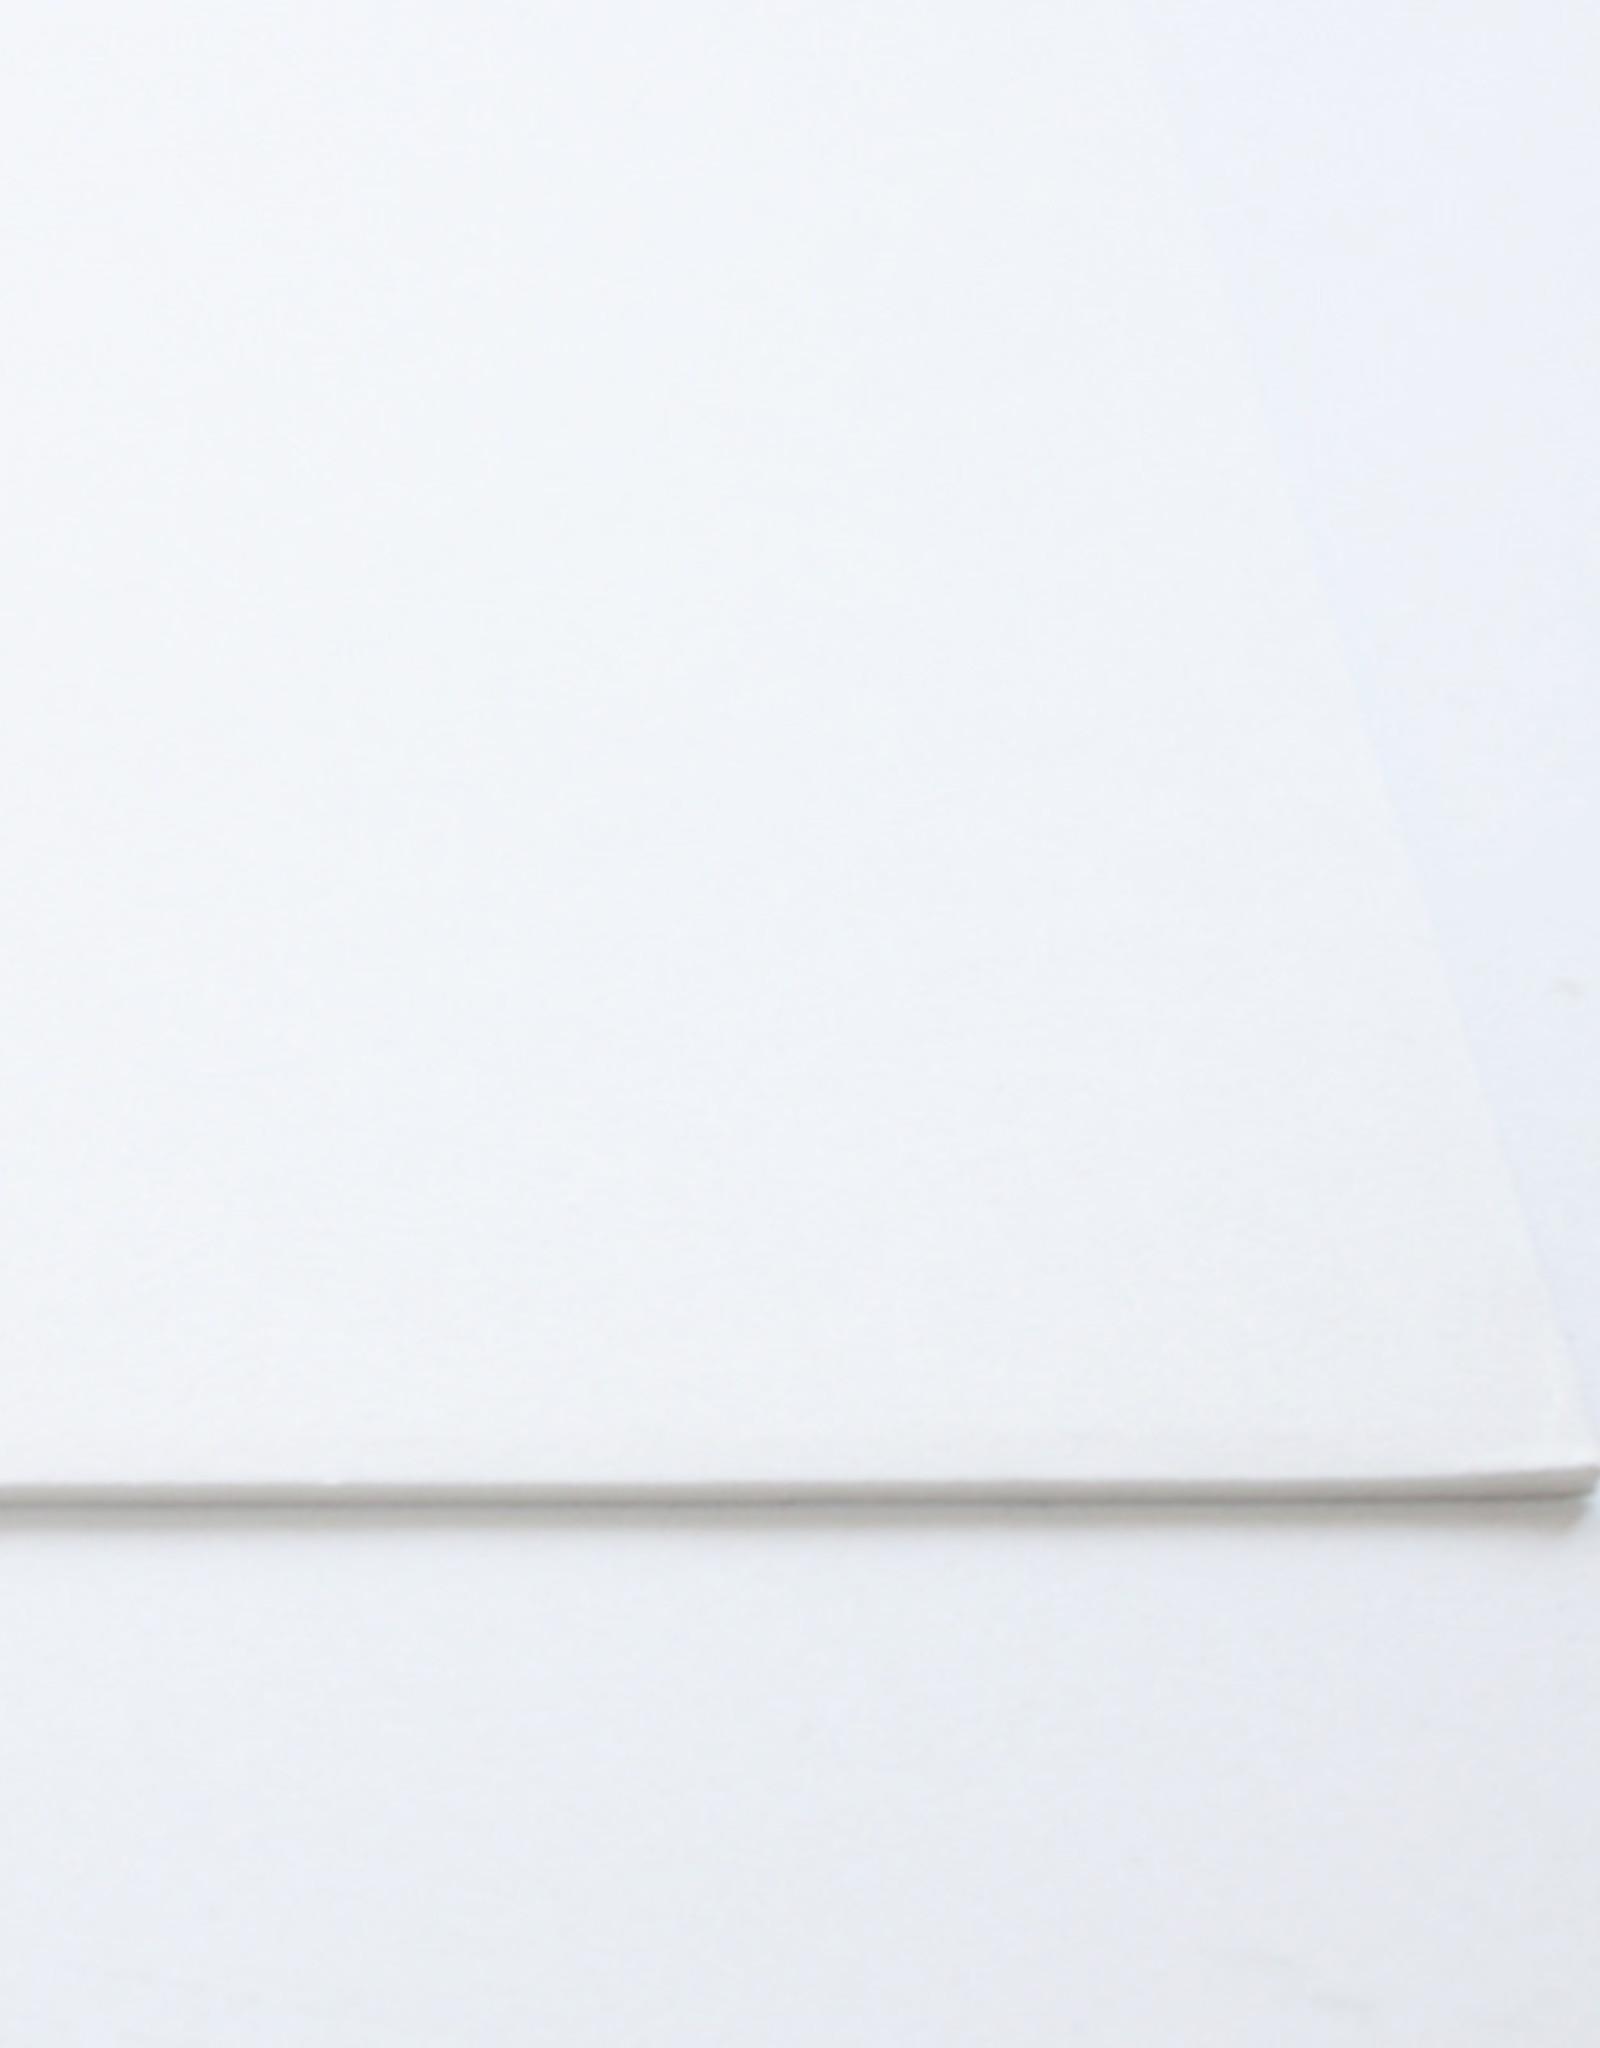 Barth 10 vel Passepartoutkarton 800 grs (± 1 mm dik) 71x 50.5 ConservaBarth natuurwit